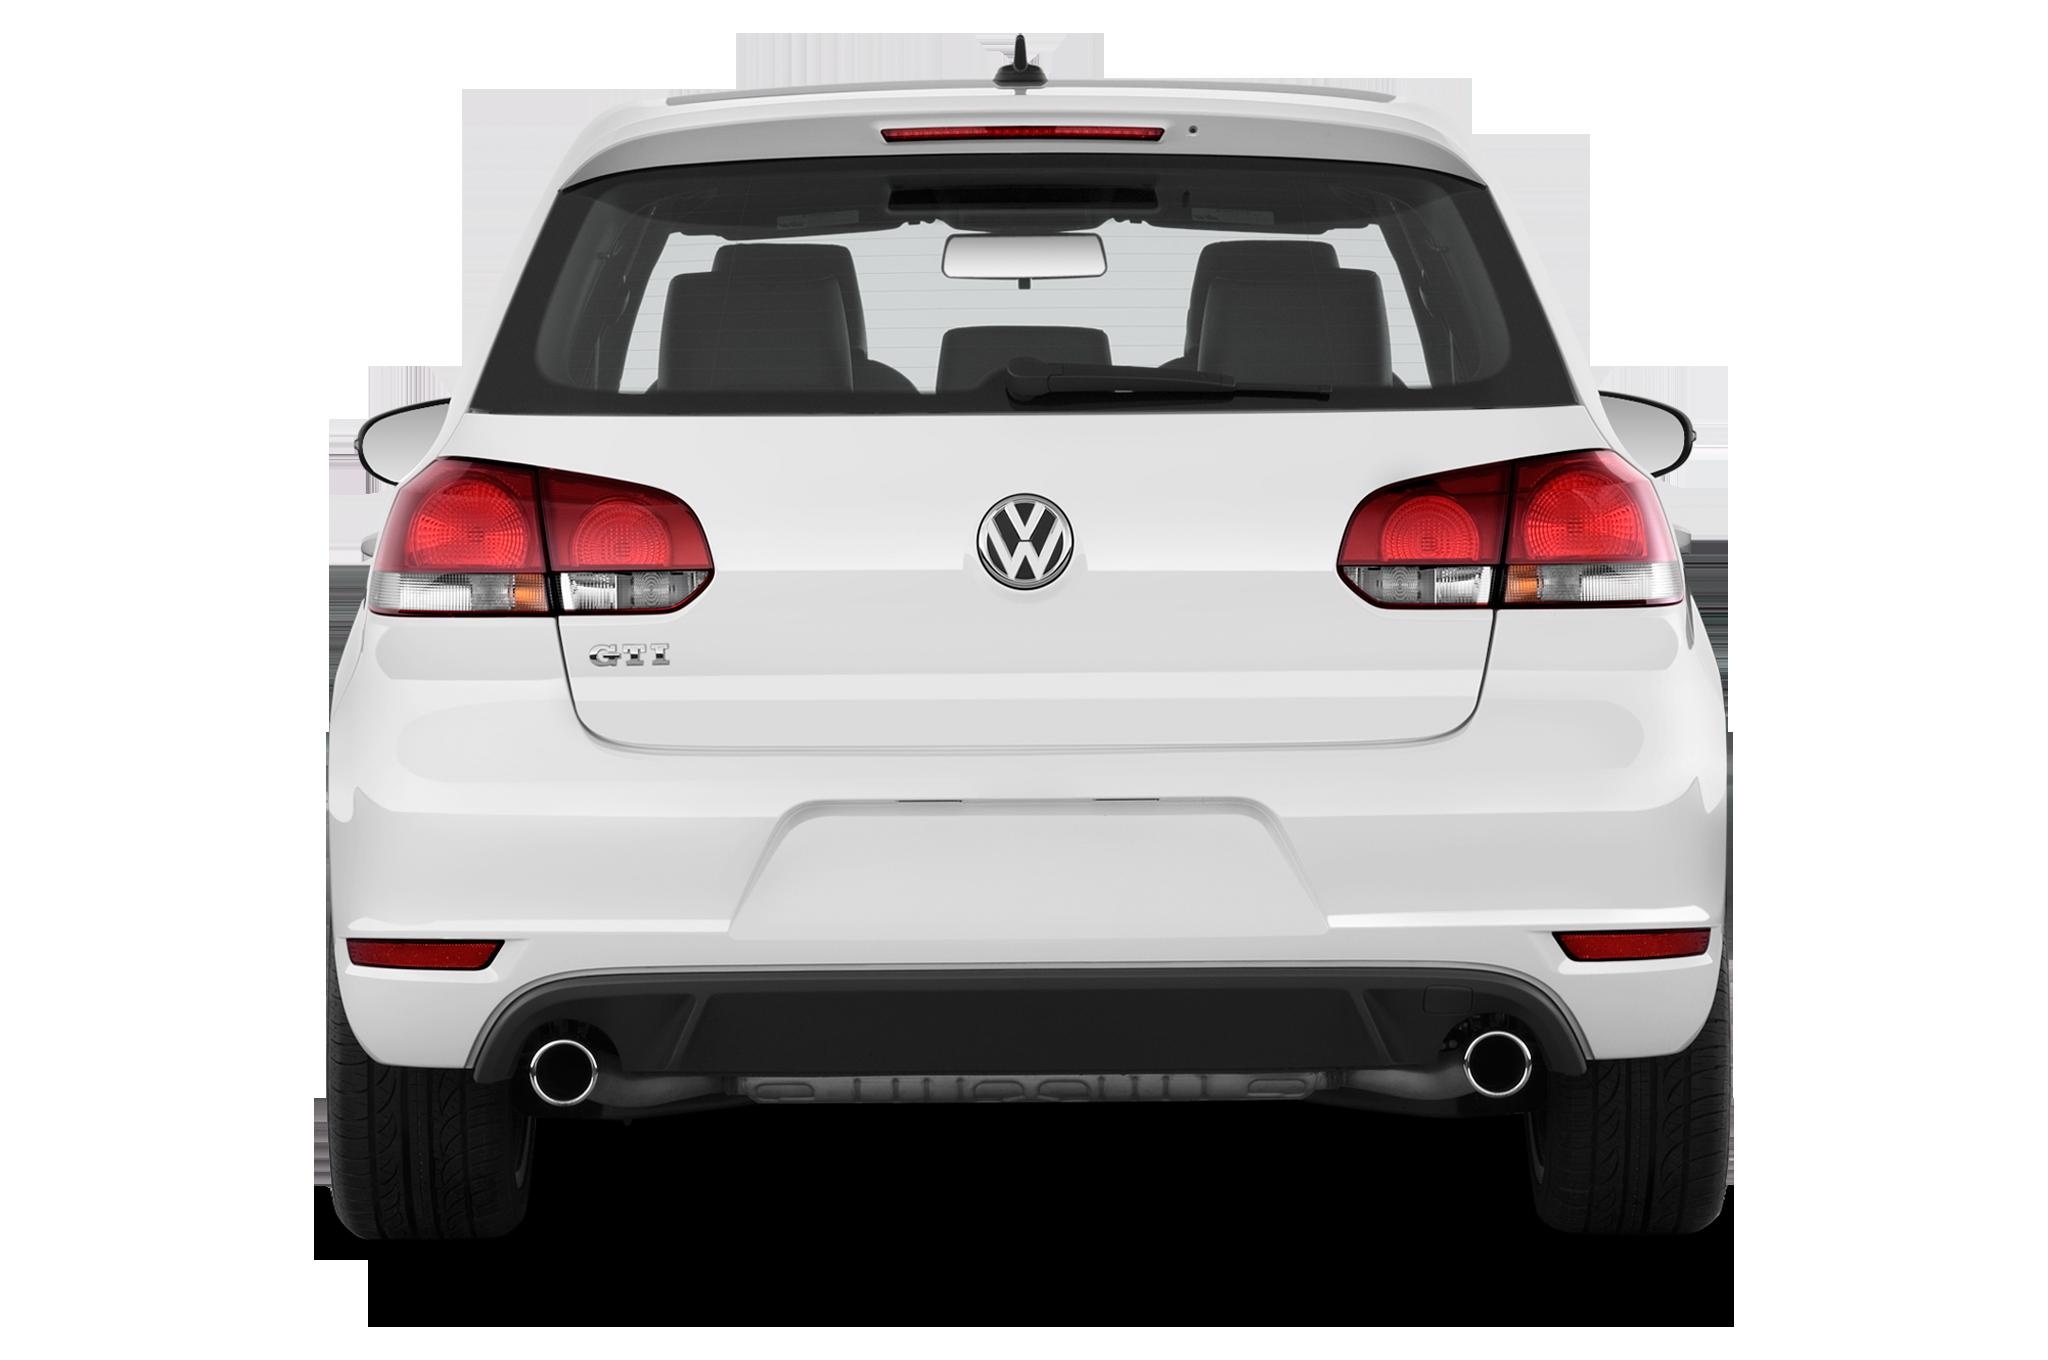 2010 Volkswagen Polo Gti 2010 Geneva Auto Show Coverage New Car Reviews Concept Cars